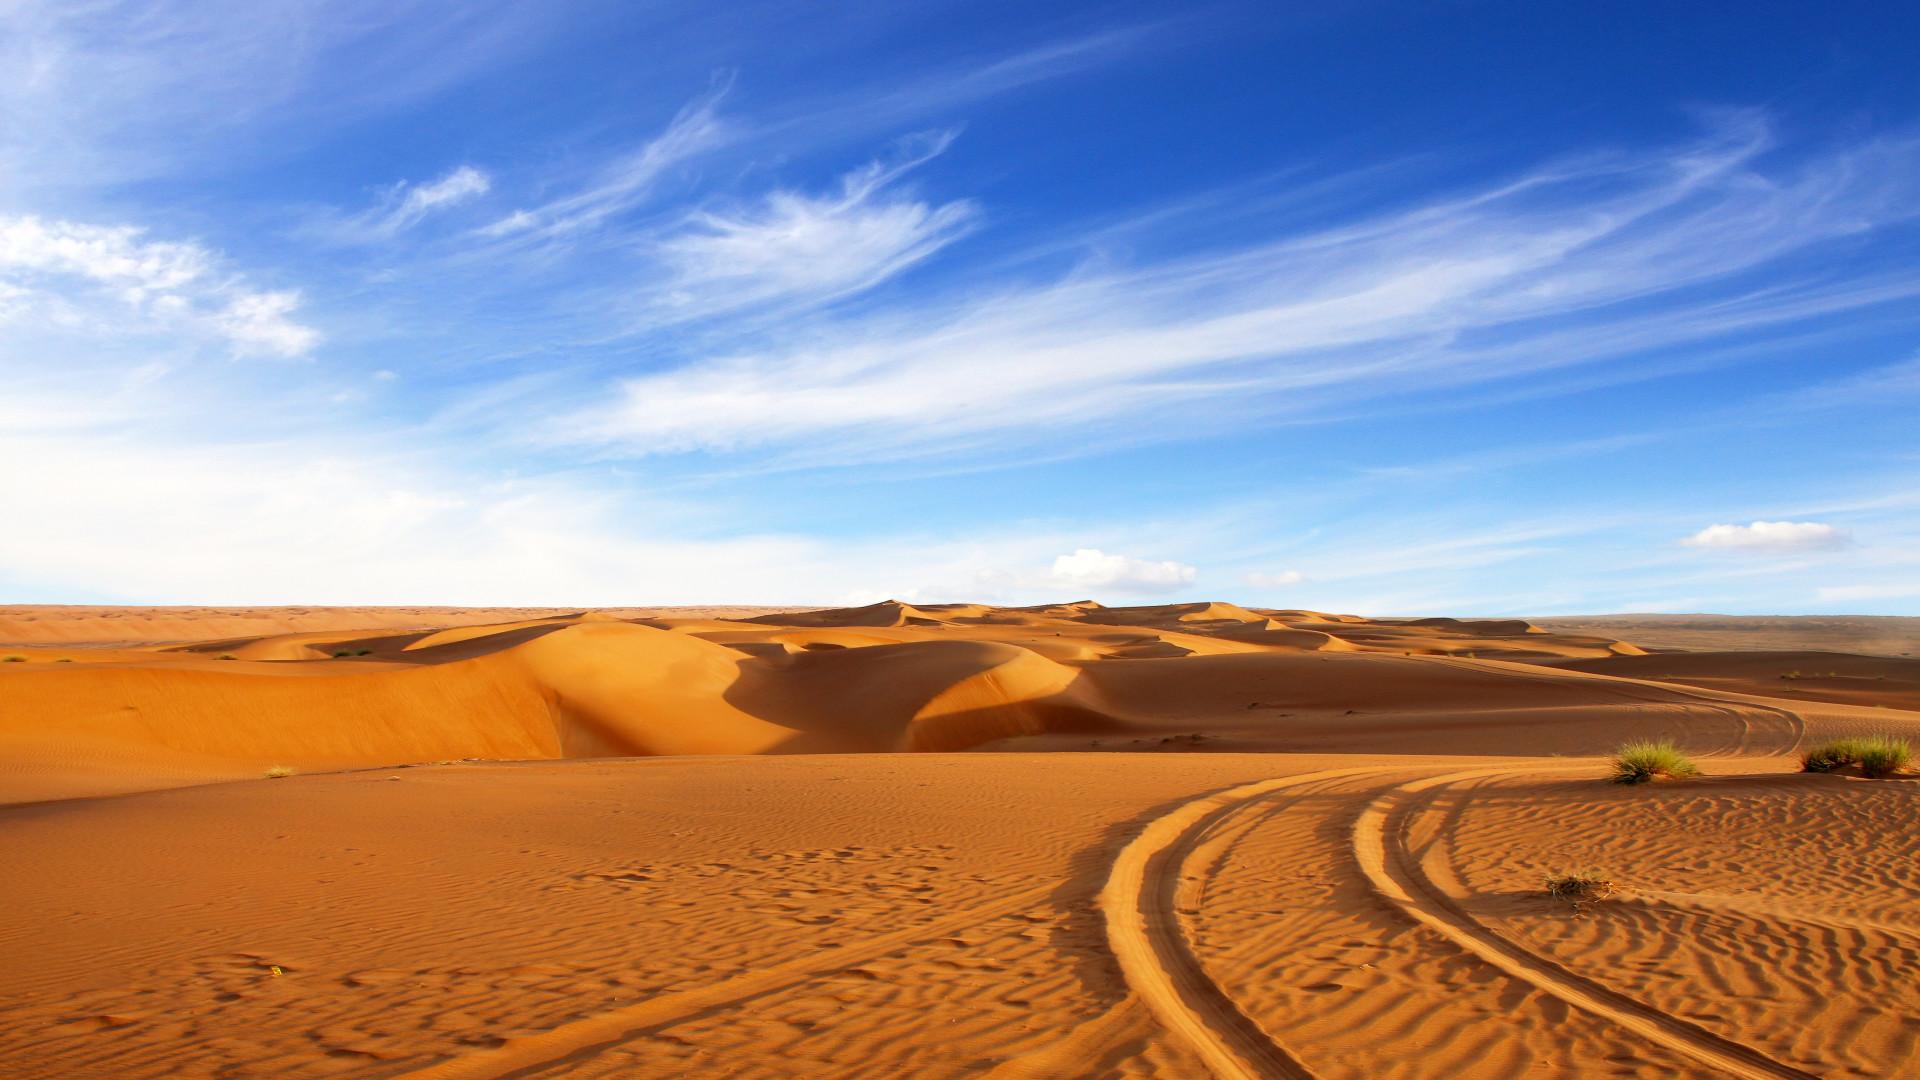 Rondreis Oman zandwoestijn Wahiba